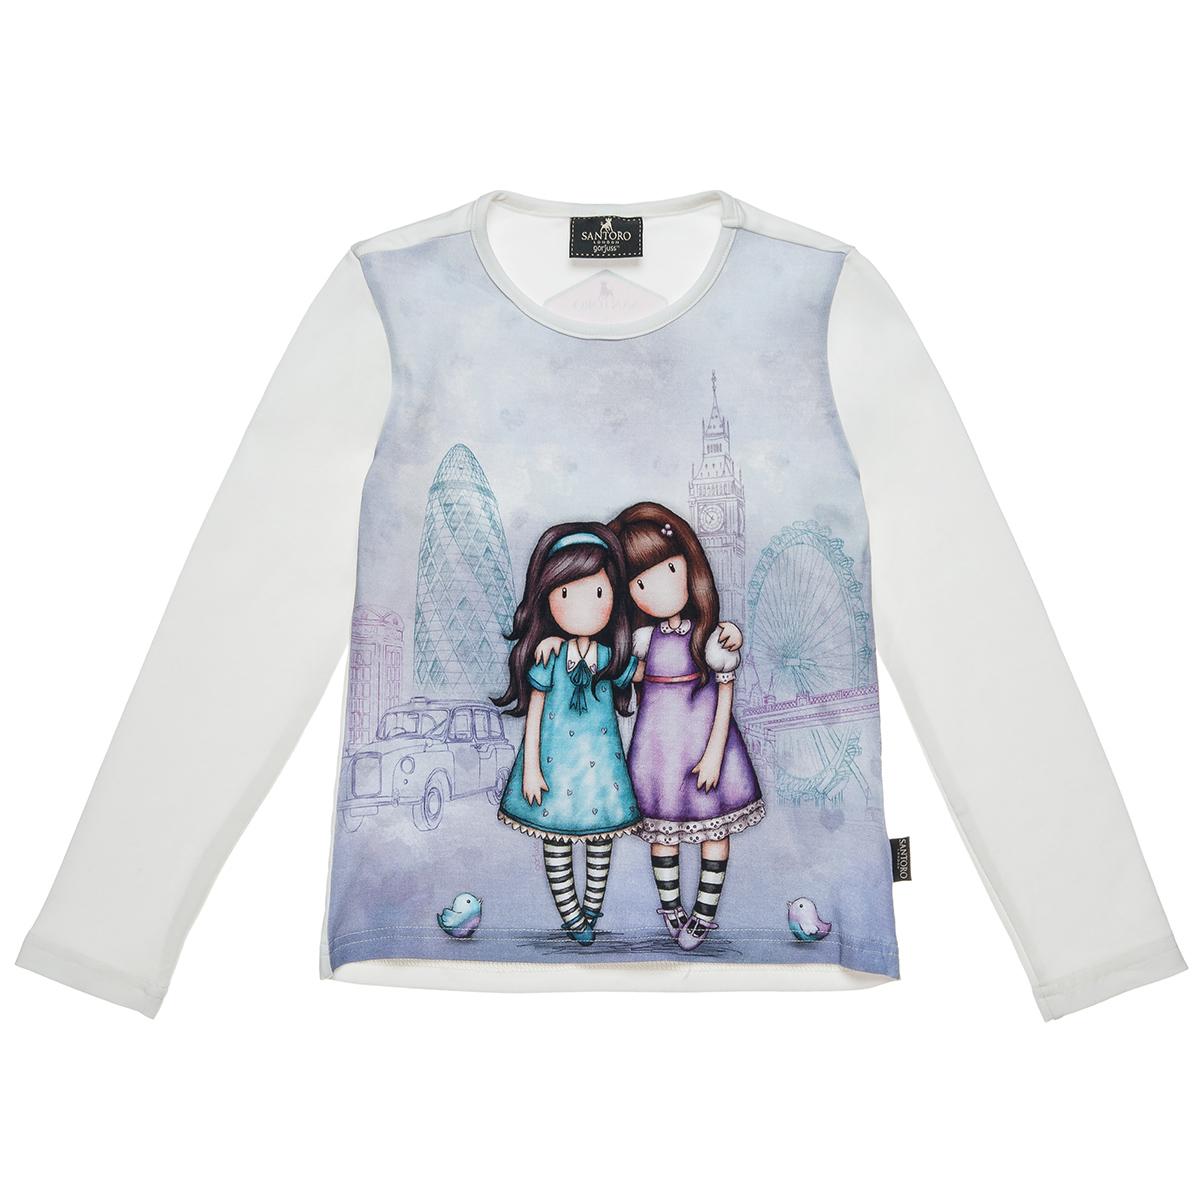 1e51fee413a Μπλούζα Santoro με τύπωμα (Κορίτσι 6-14 ετών) 00121353 - Εκρού - 3788